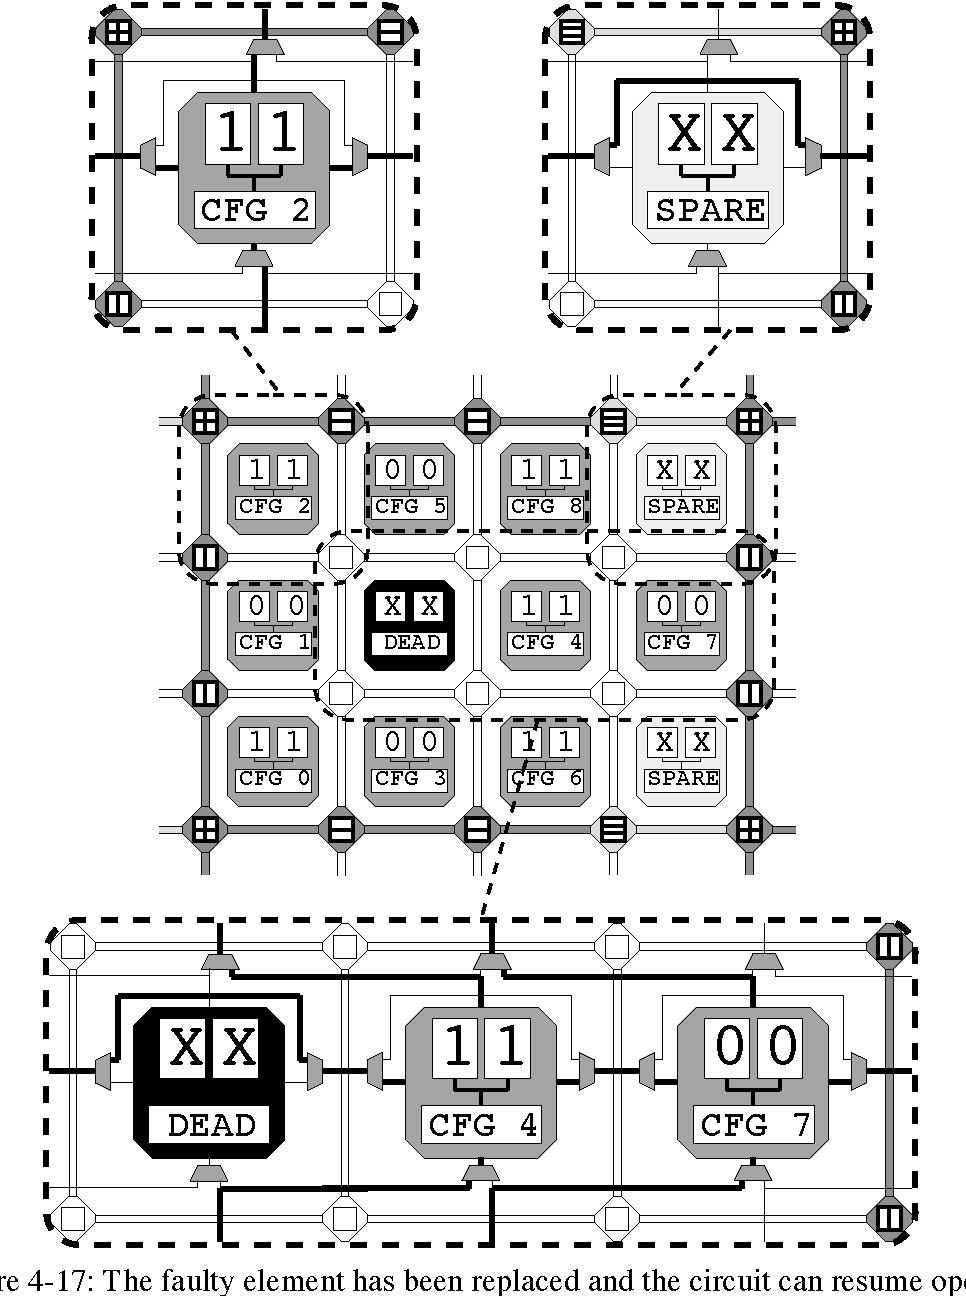 figure 4-17